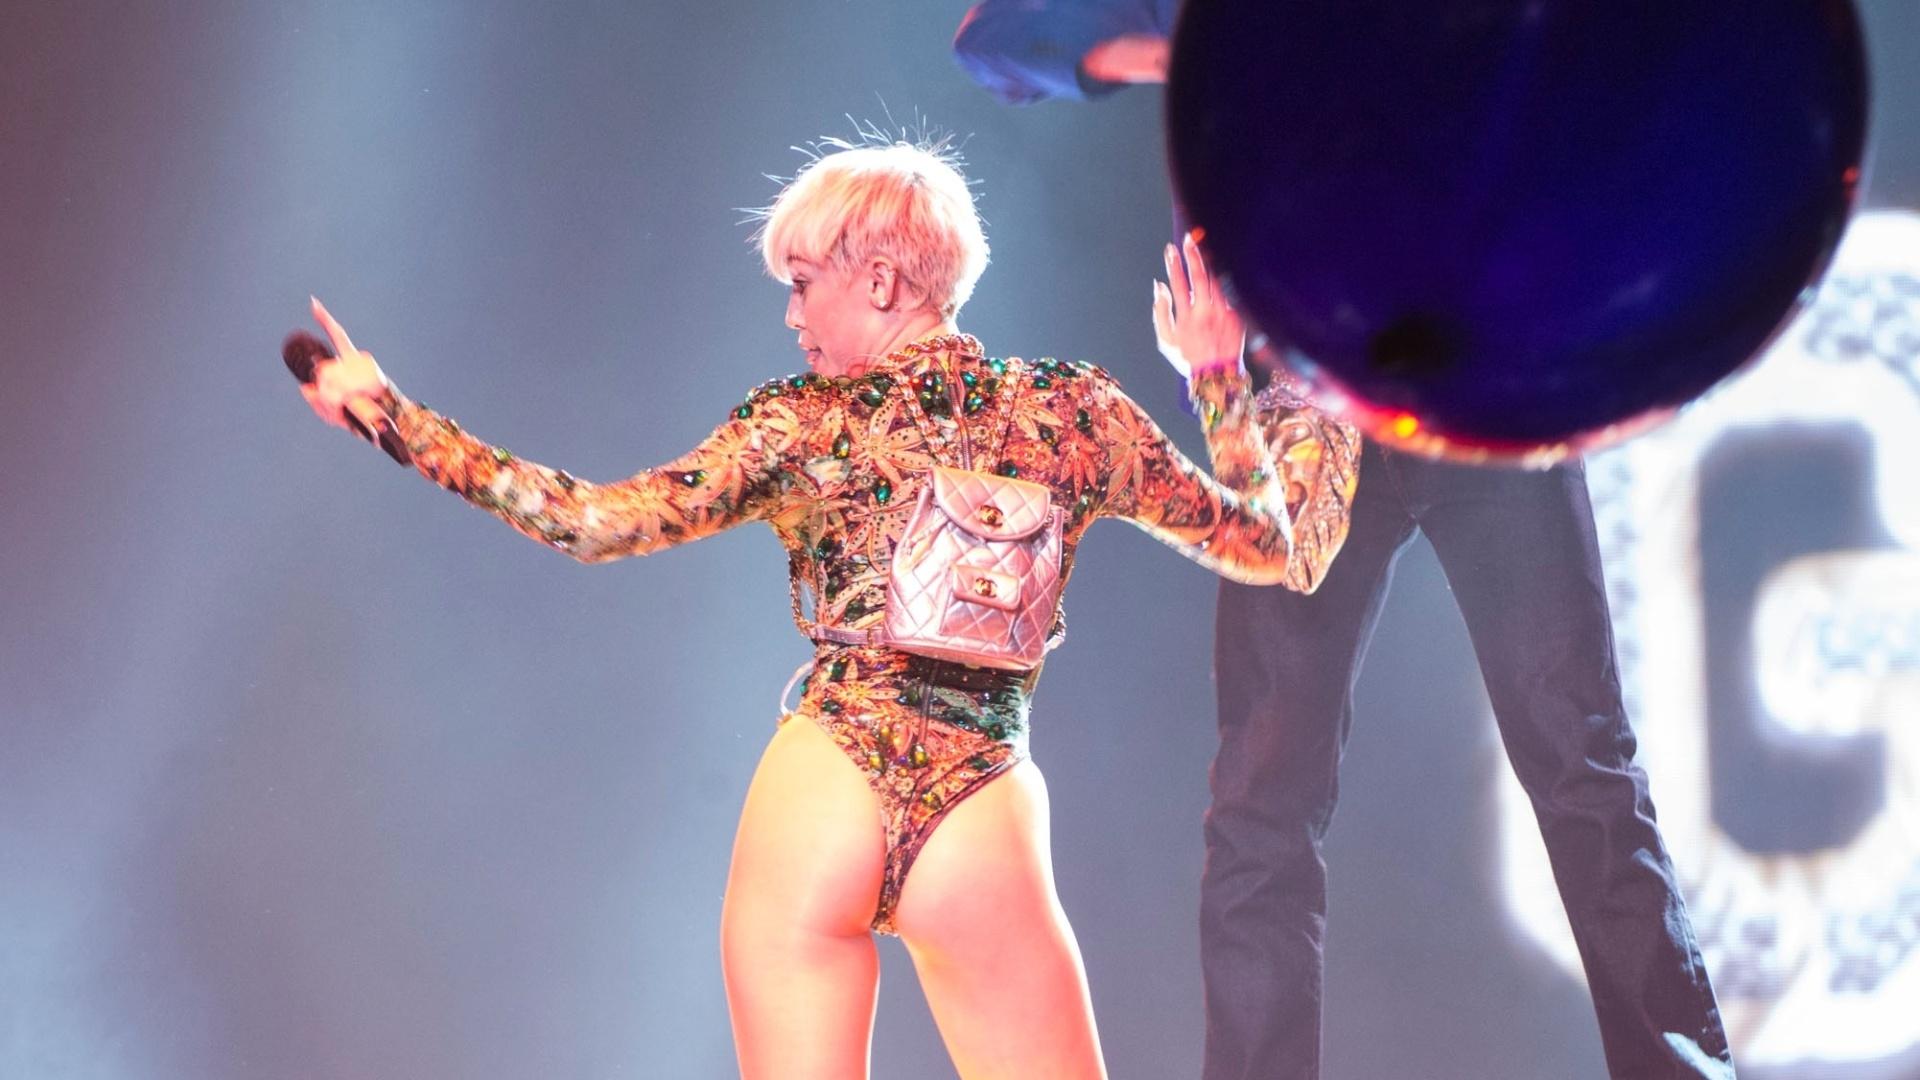 15.fev.2014 - A cantora Miley Cyrus estreou a turnê